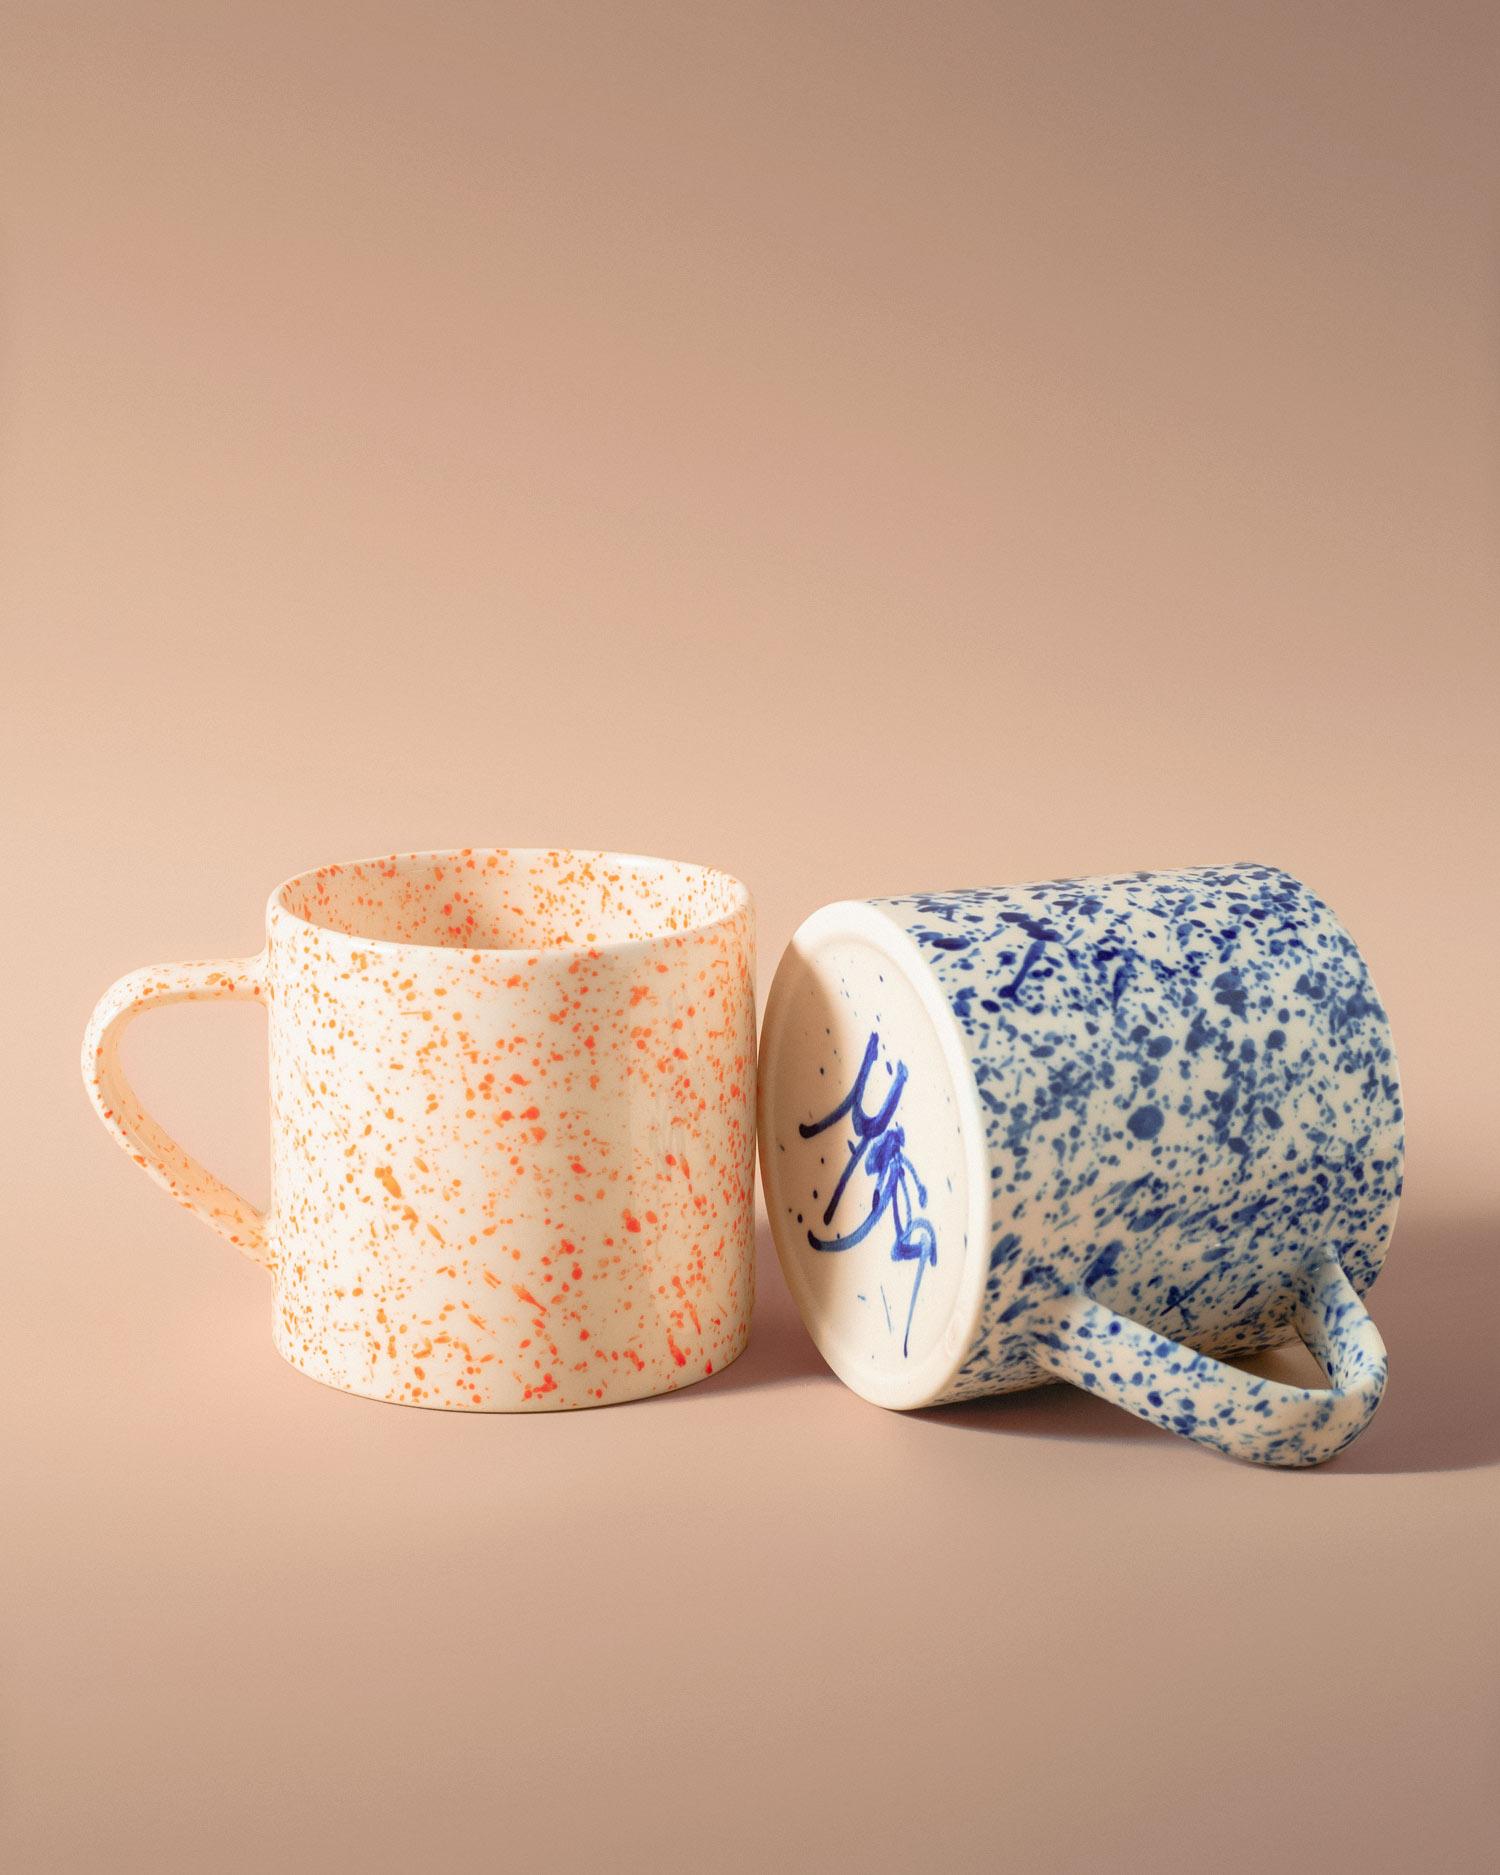 nebolusa-coffee-cups-1-pp.jpg